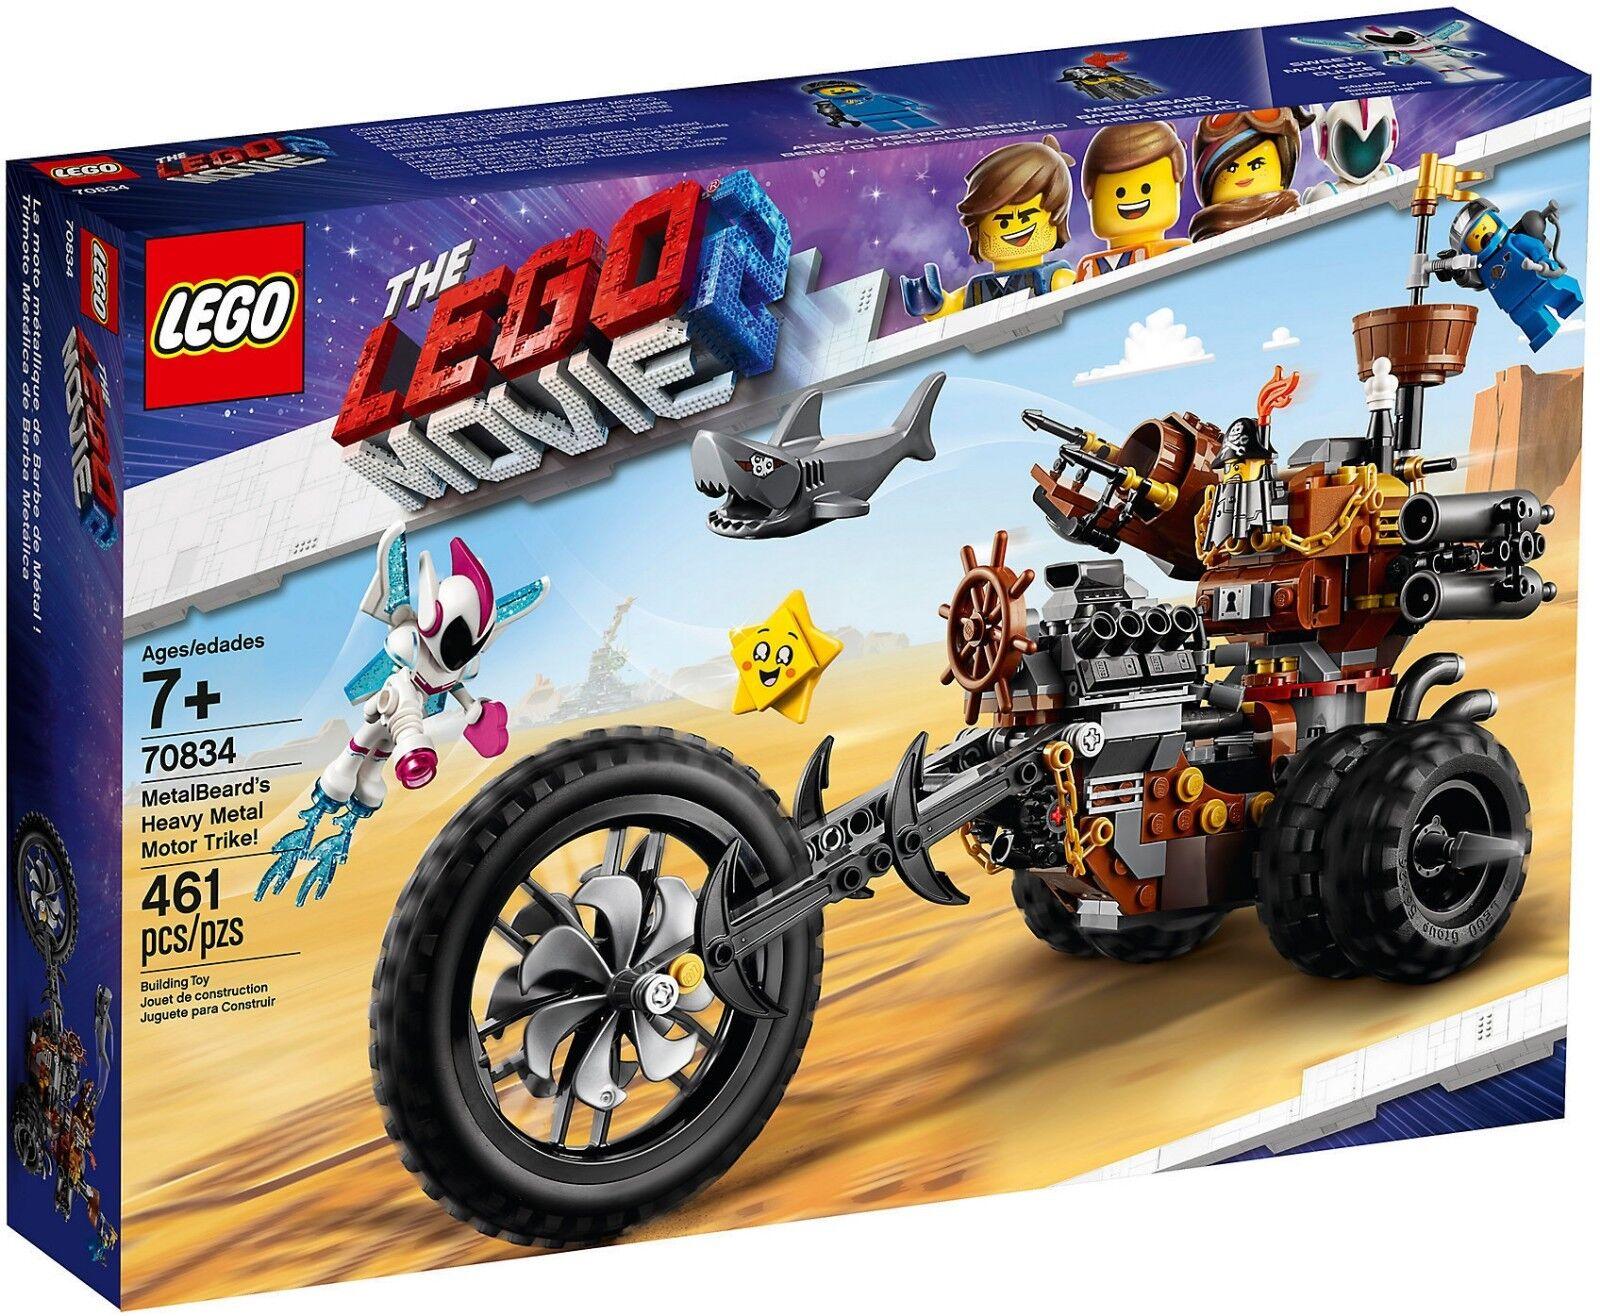 LEGO ® THE LEGO MOVIE 2™ 70834 EisenBarts Heavy-Metal-Trike  Benny Apokalypstadt